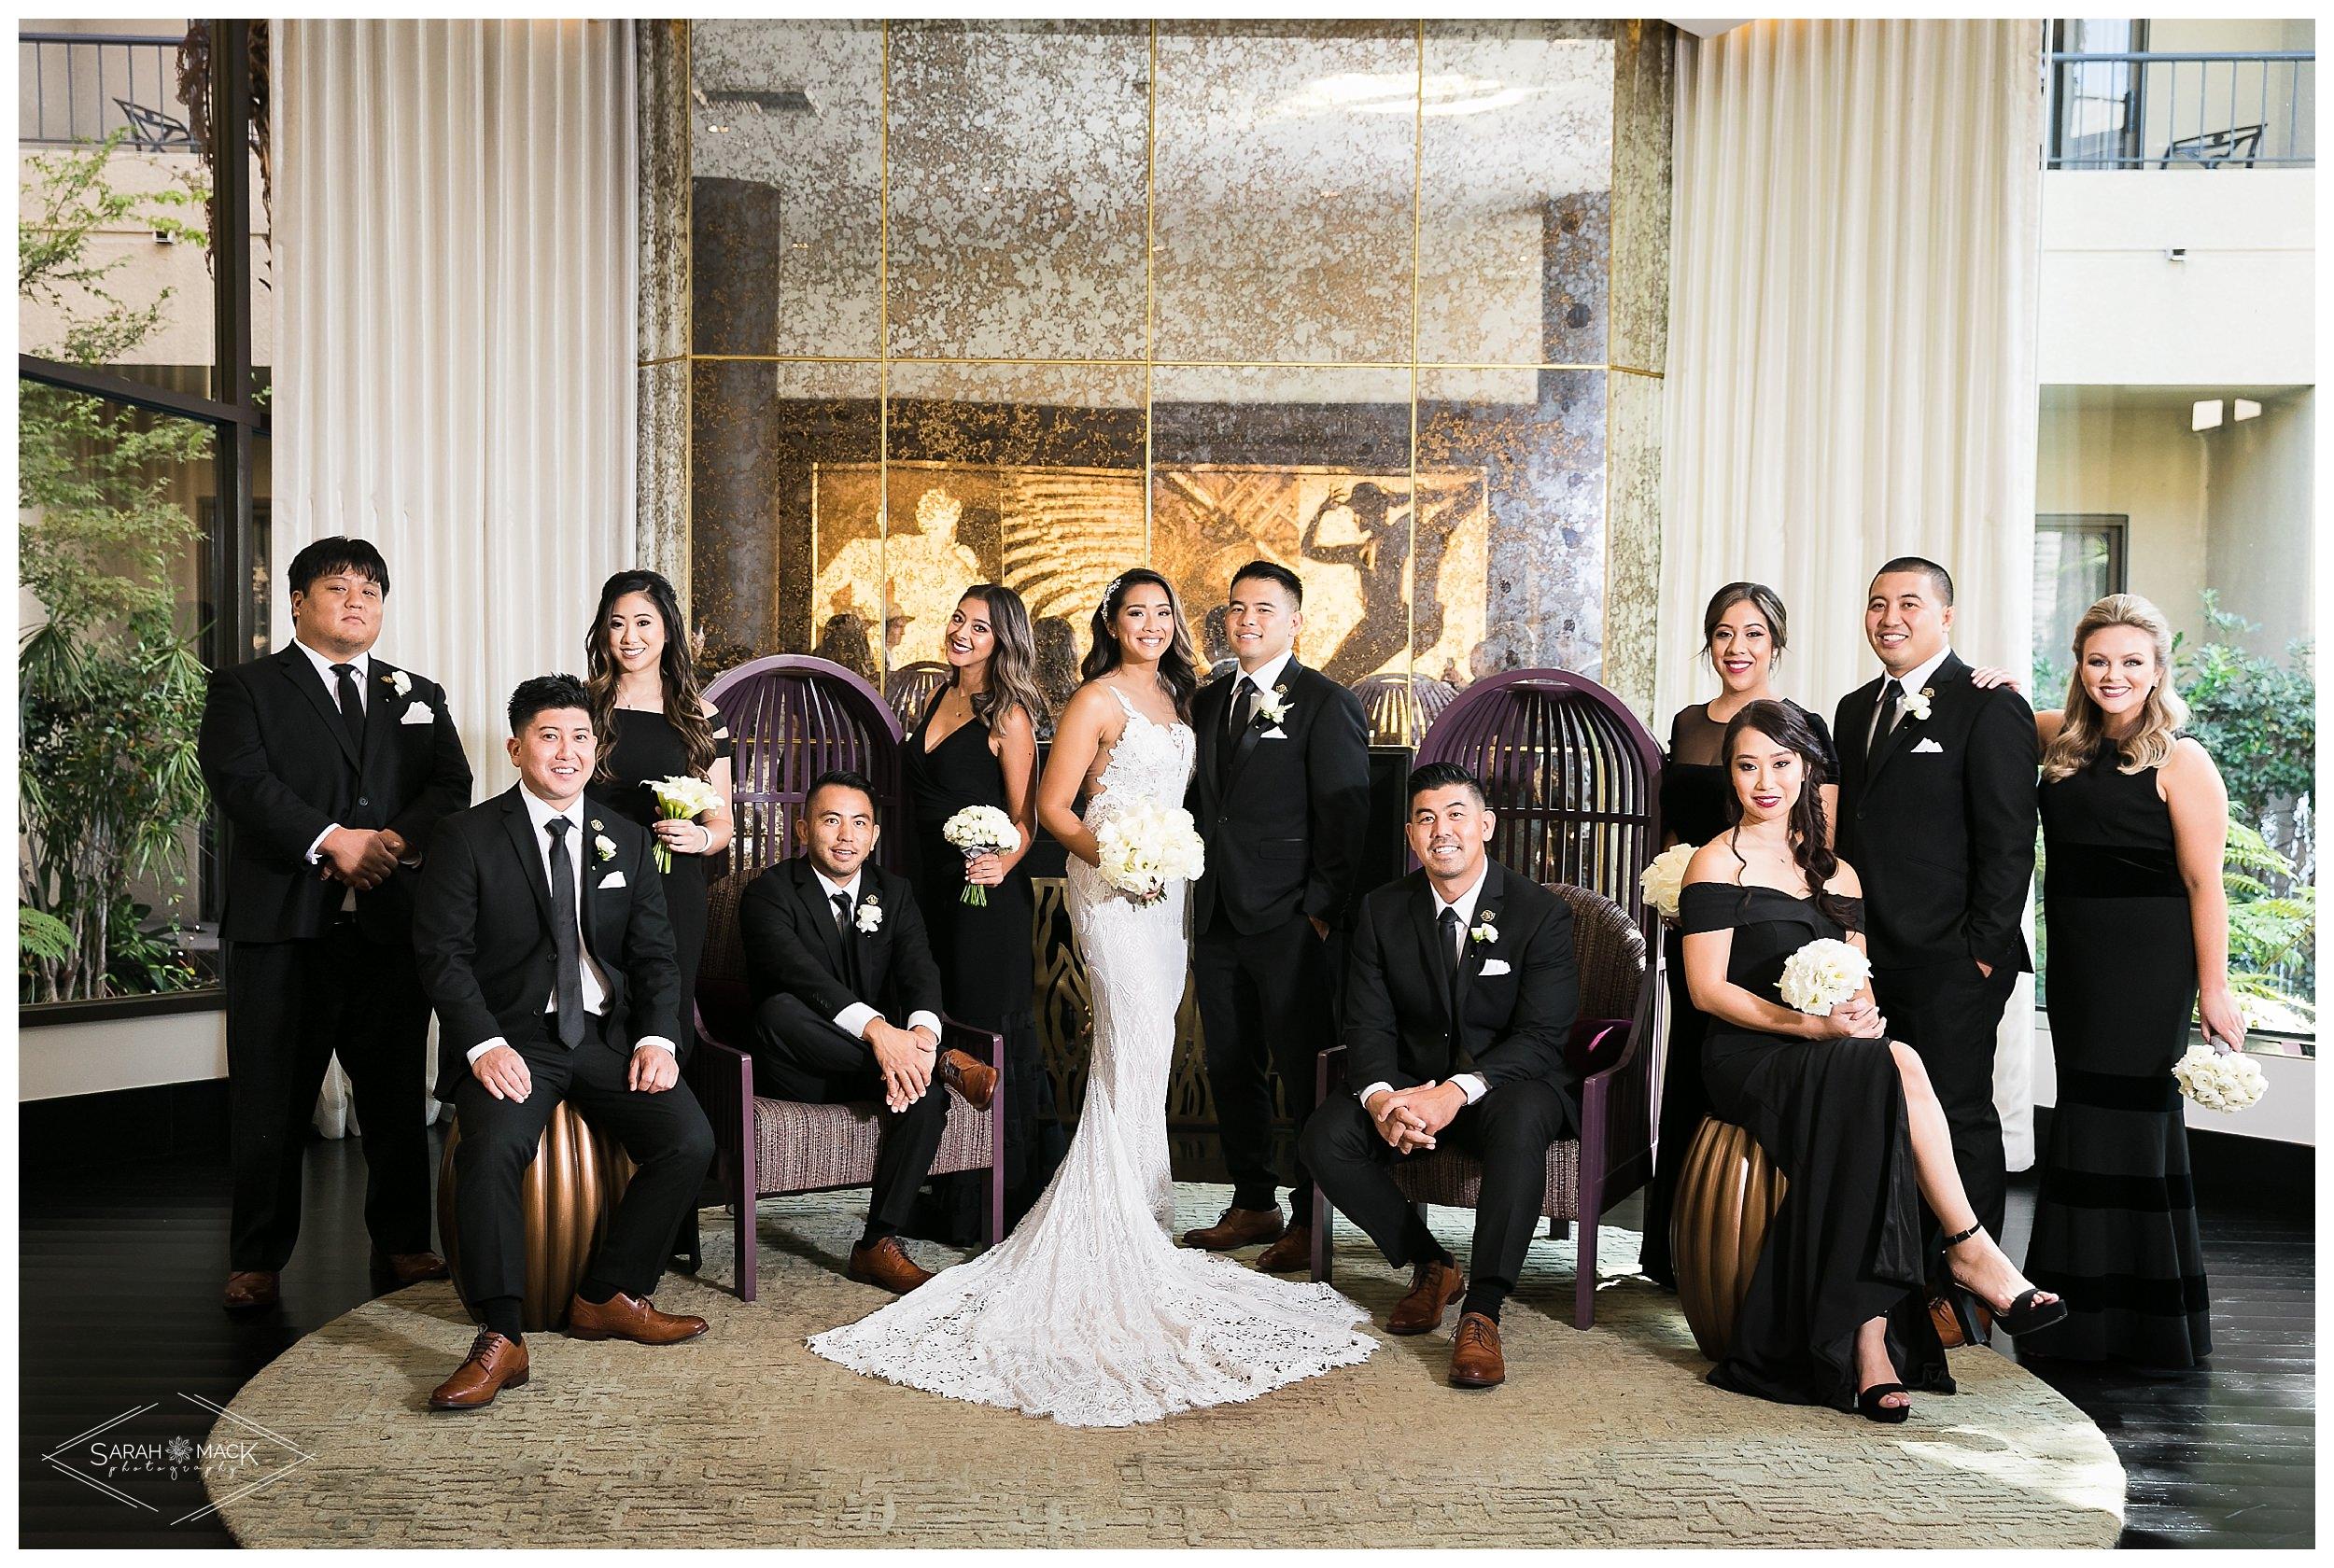 LE-Avenue-of-the-Arts-Costa-Mesa-Wedding-Photography-0085.jpg